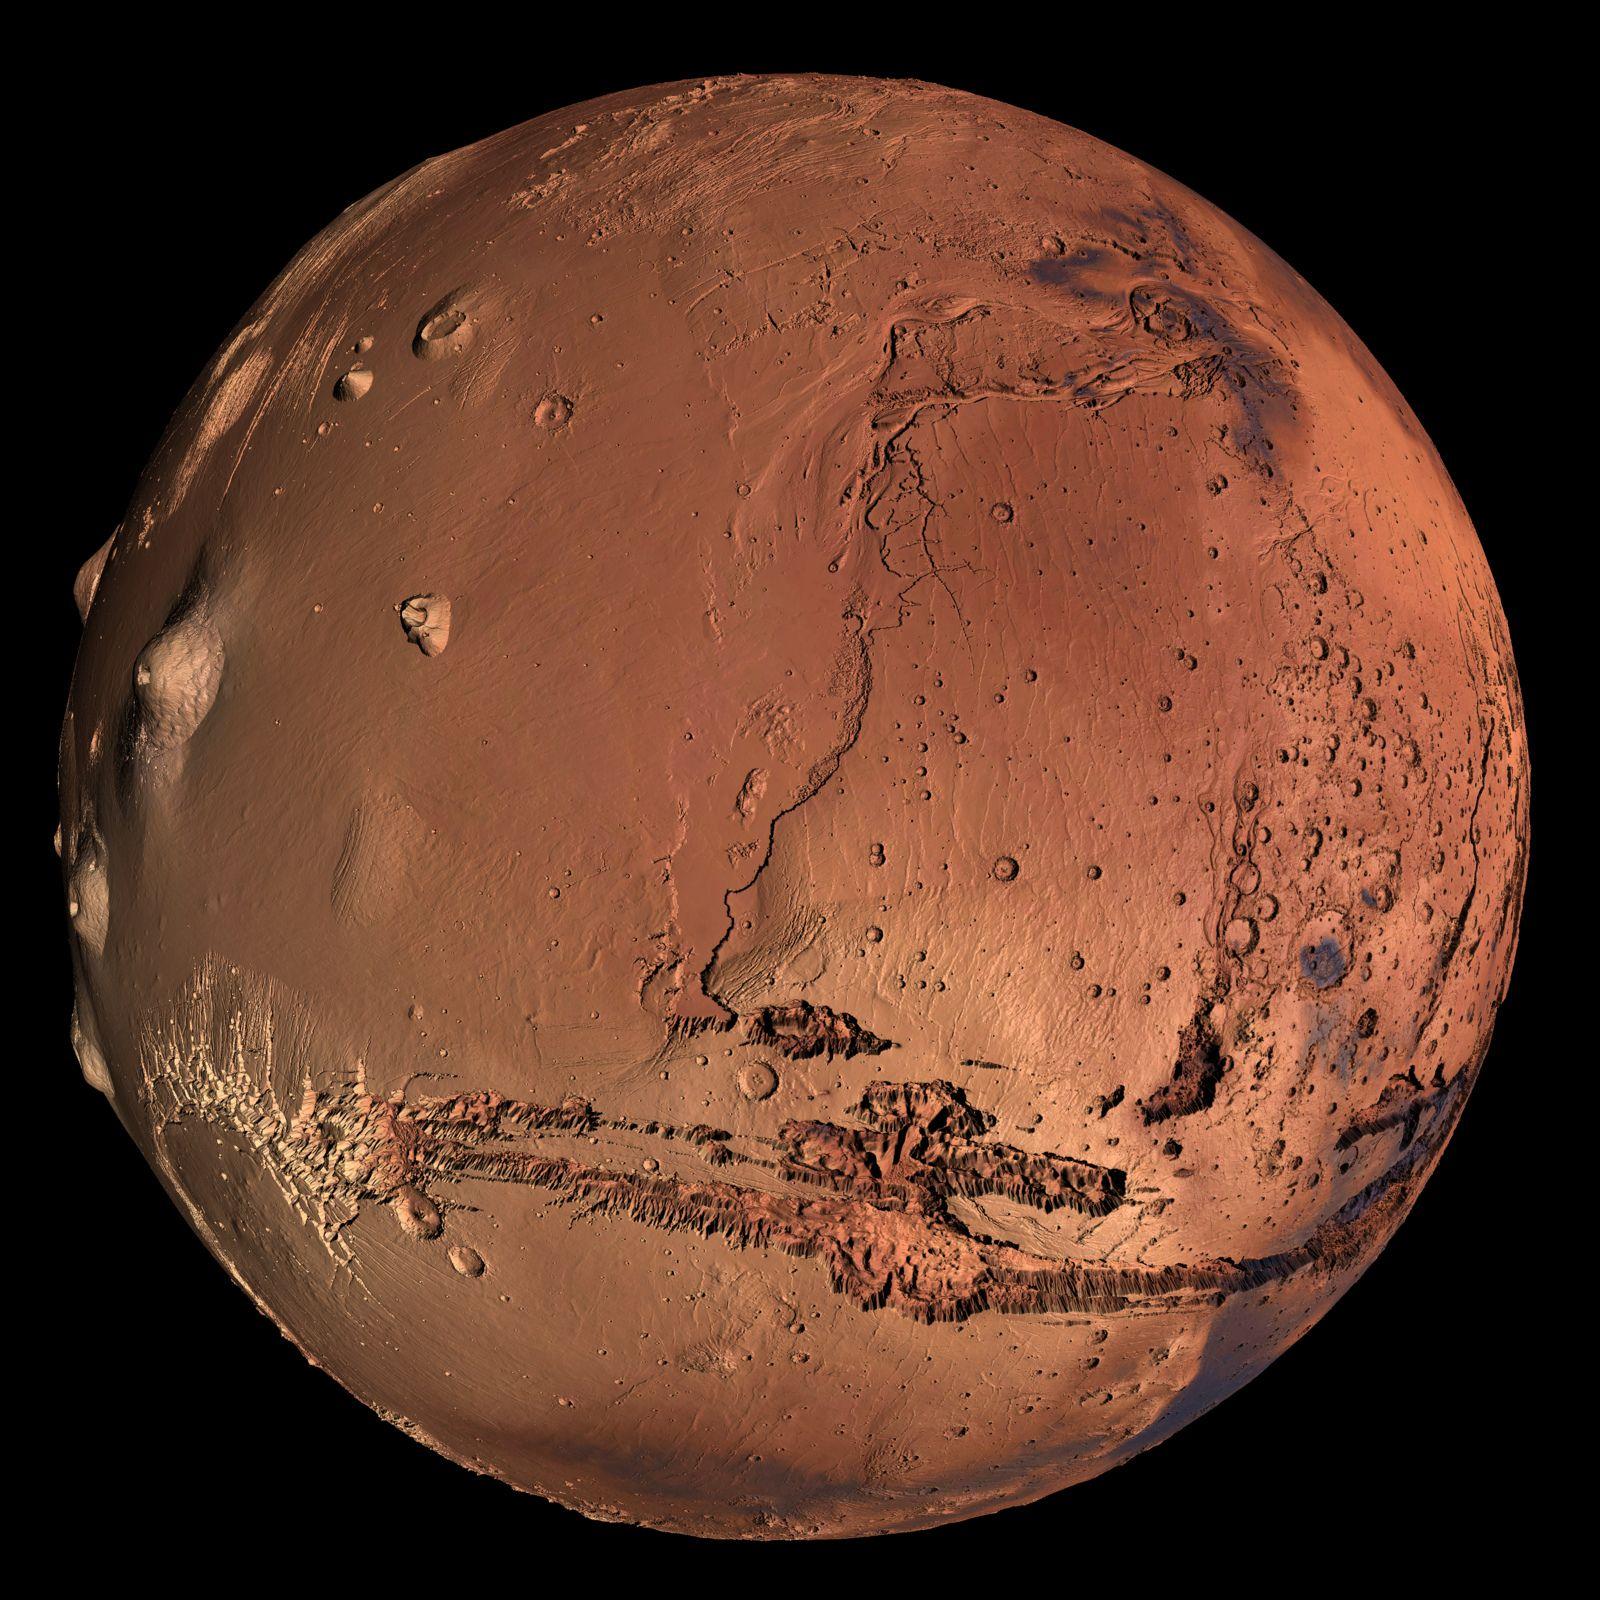 Kerberos Moon Of Plluto: Mars Visualization With Satellite Imagery Overlay